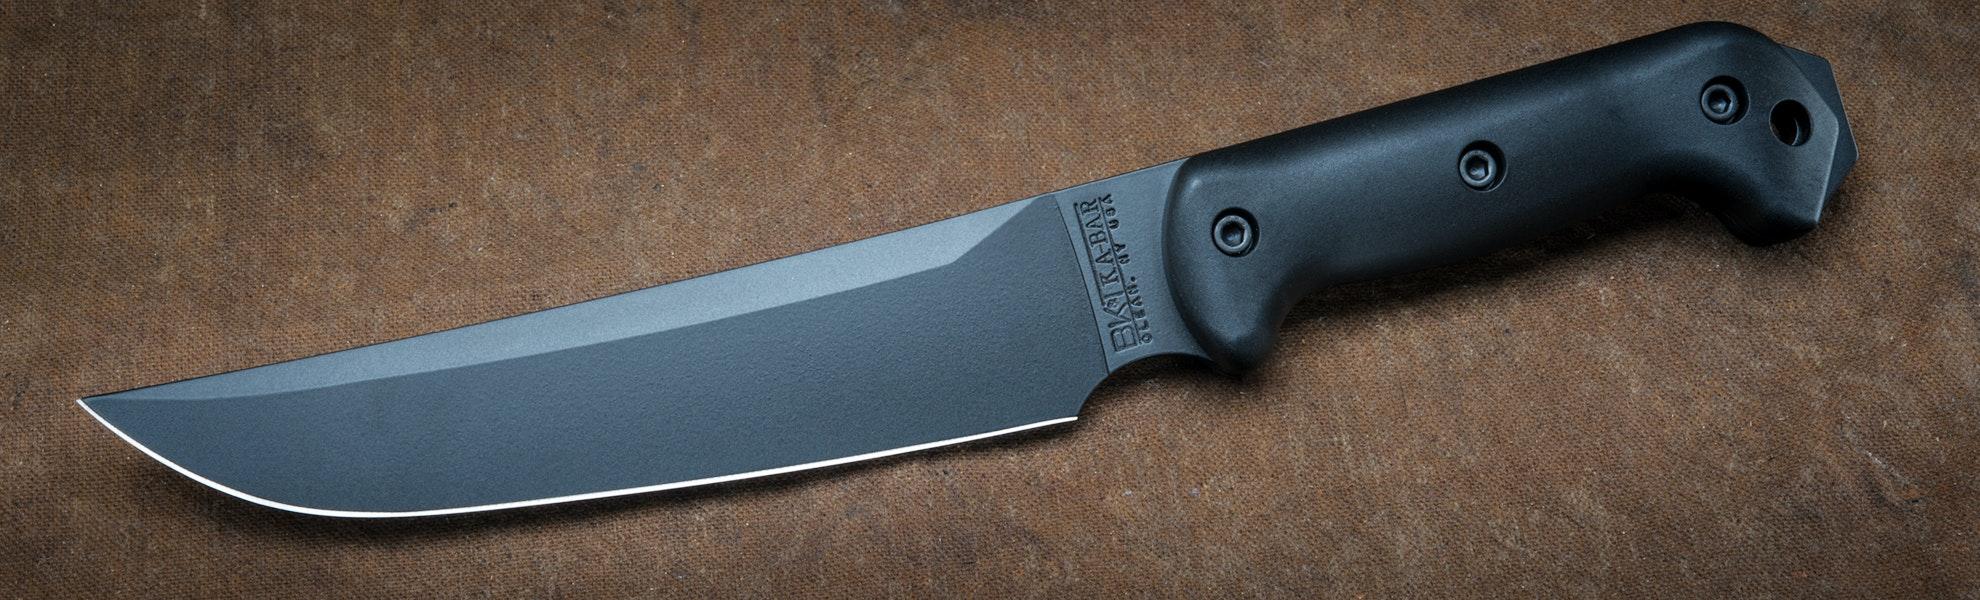 ka bar becker magnum c knife price reviews massdrop